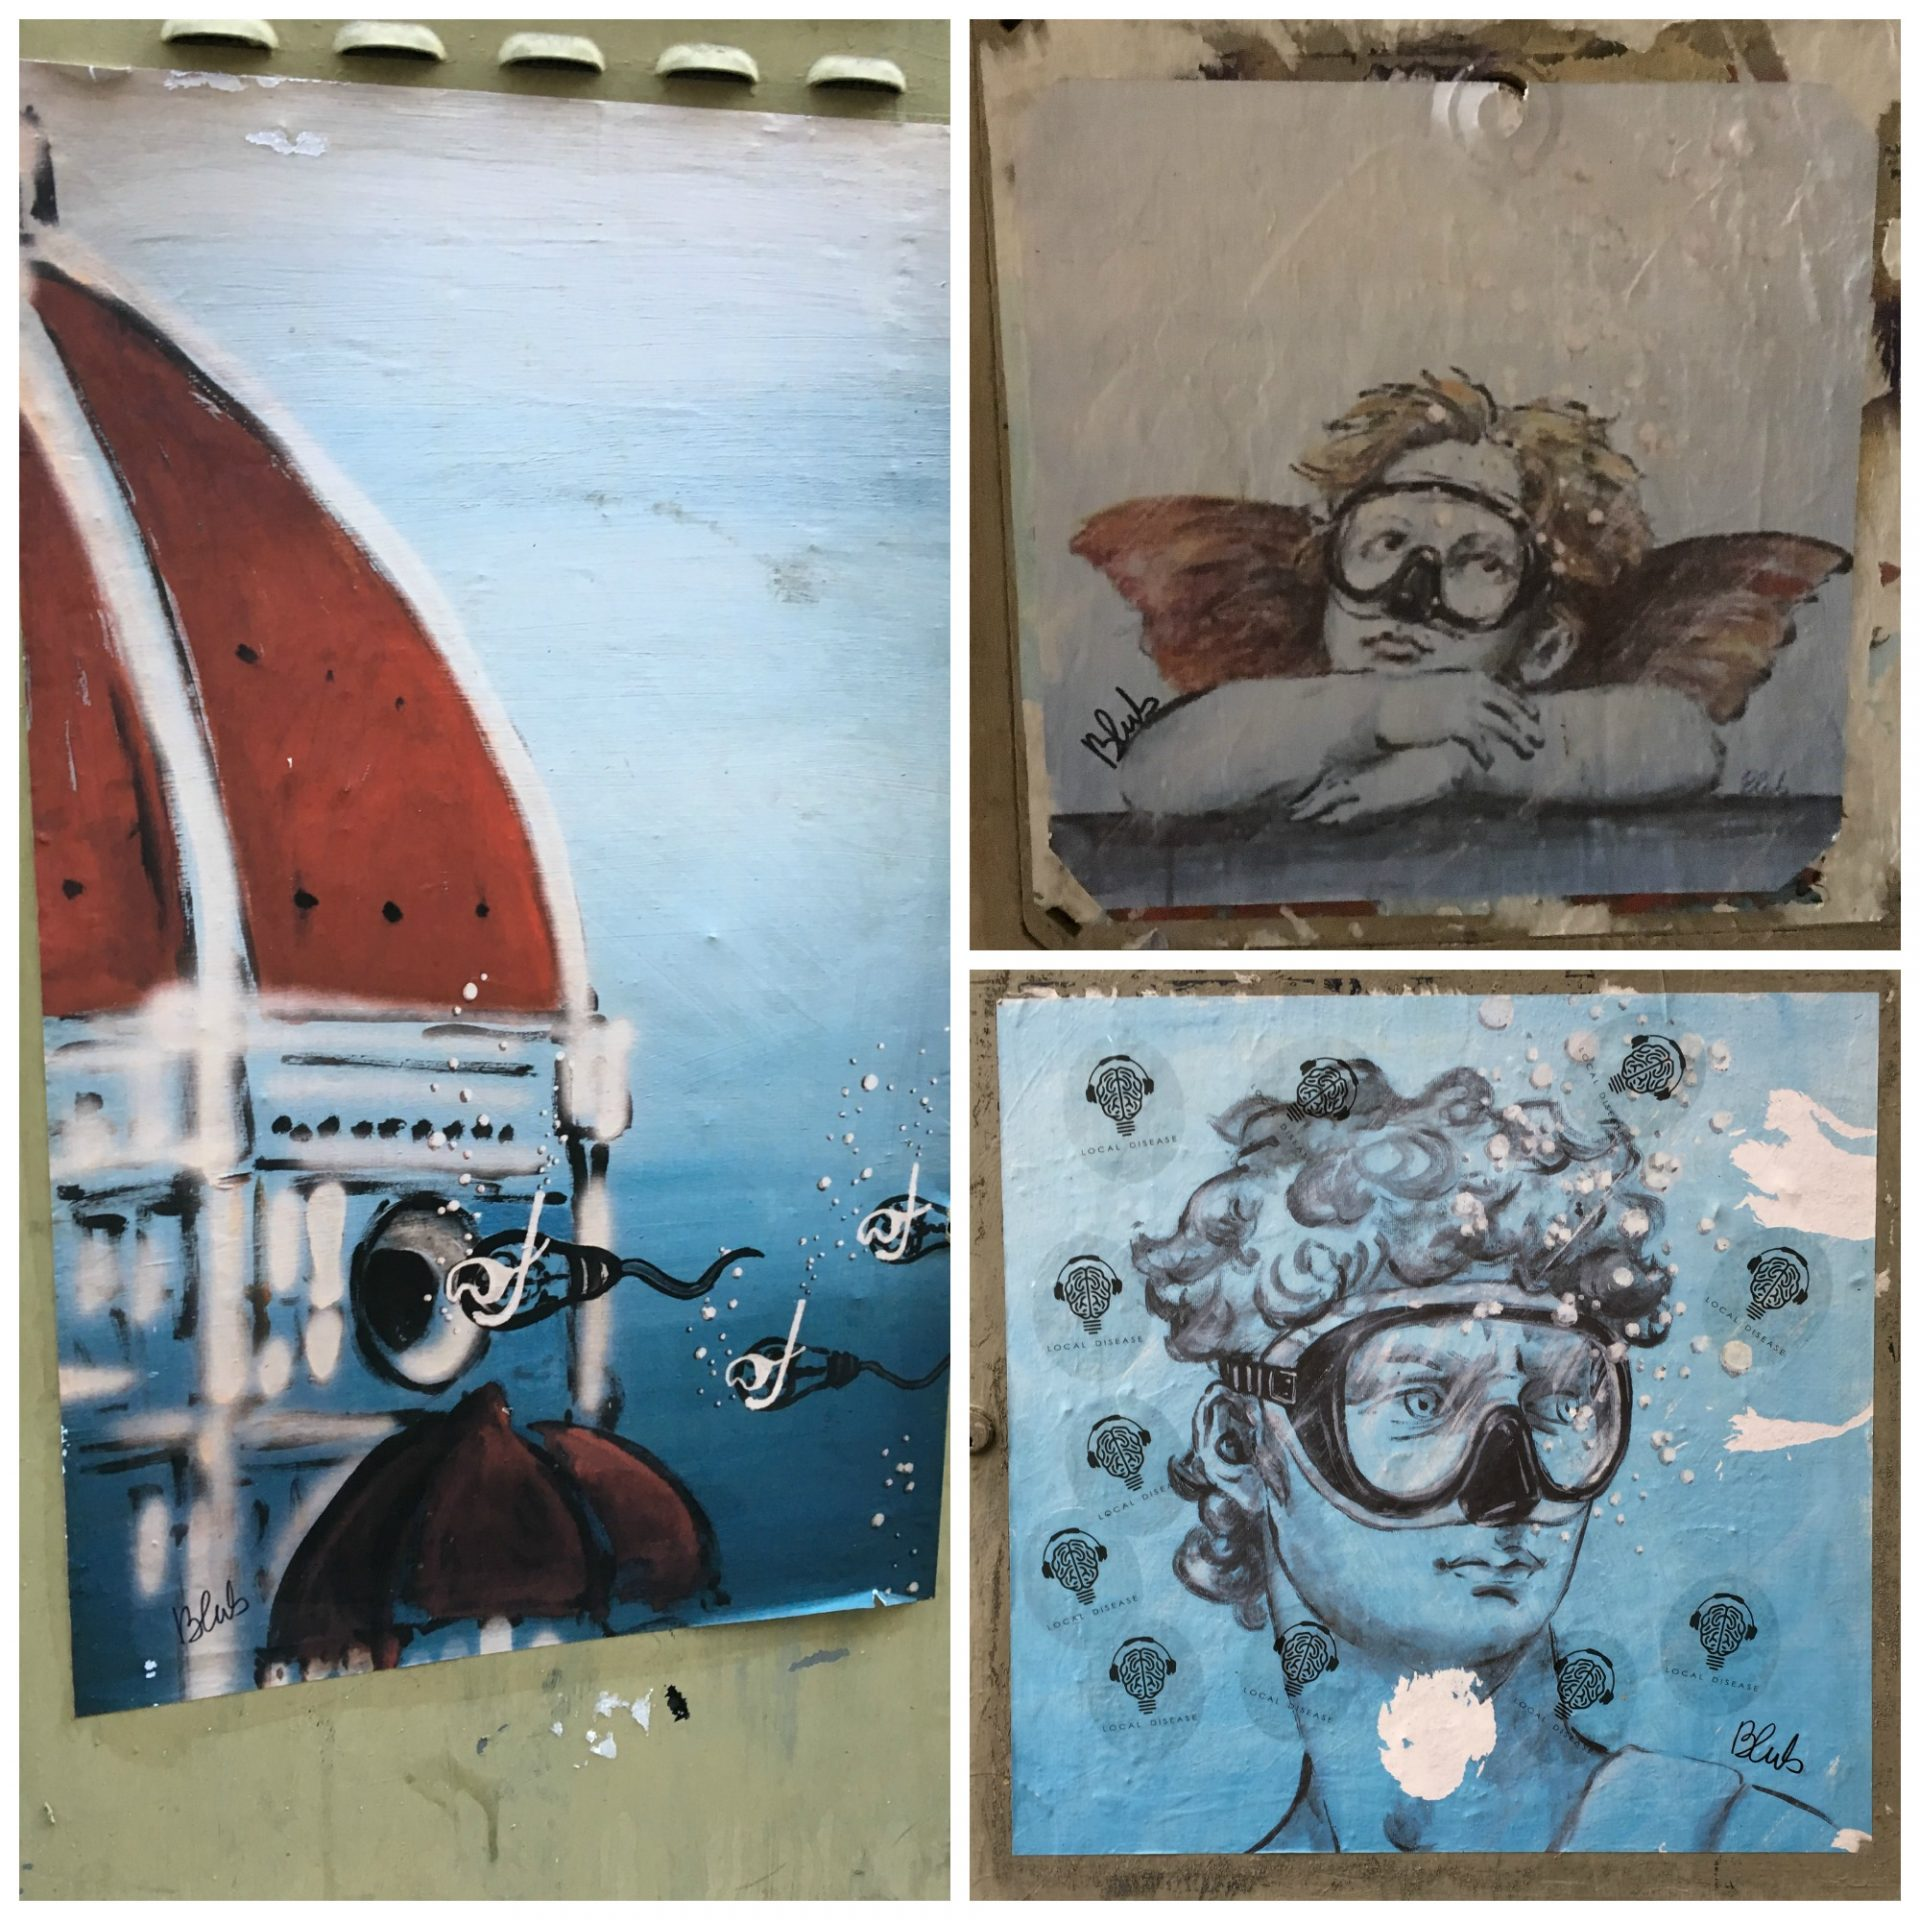 Blub Florence guerrilla art. Art knows how to swim underwater art Italy